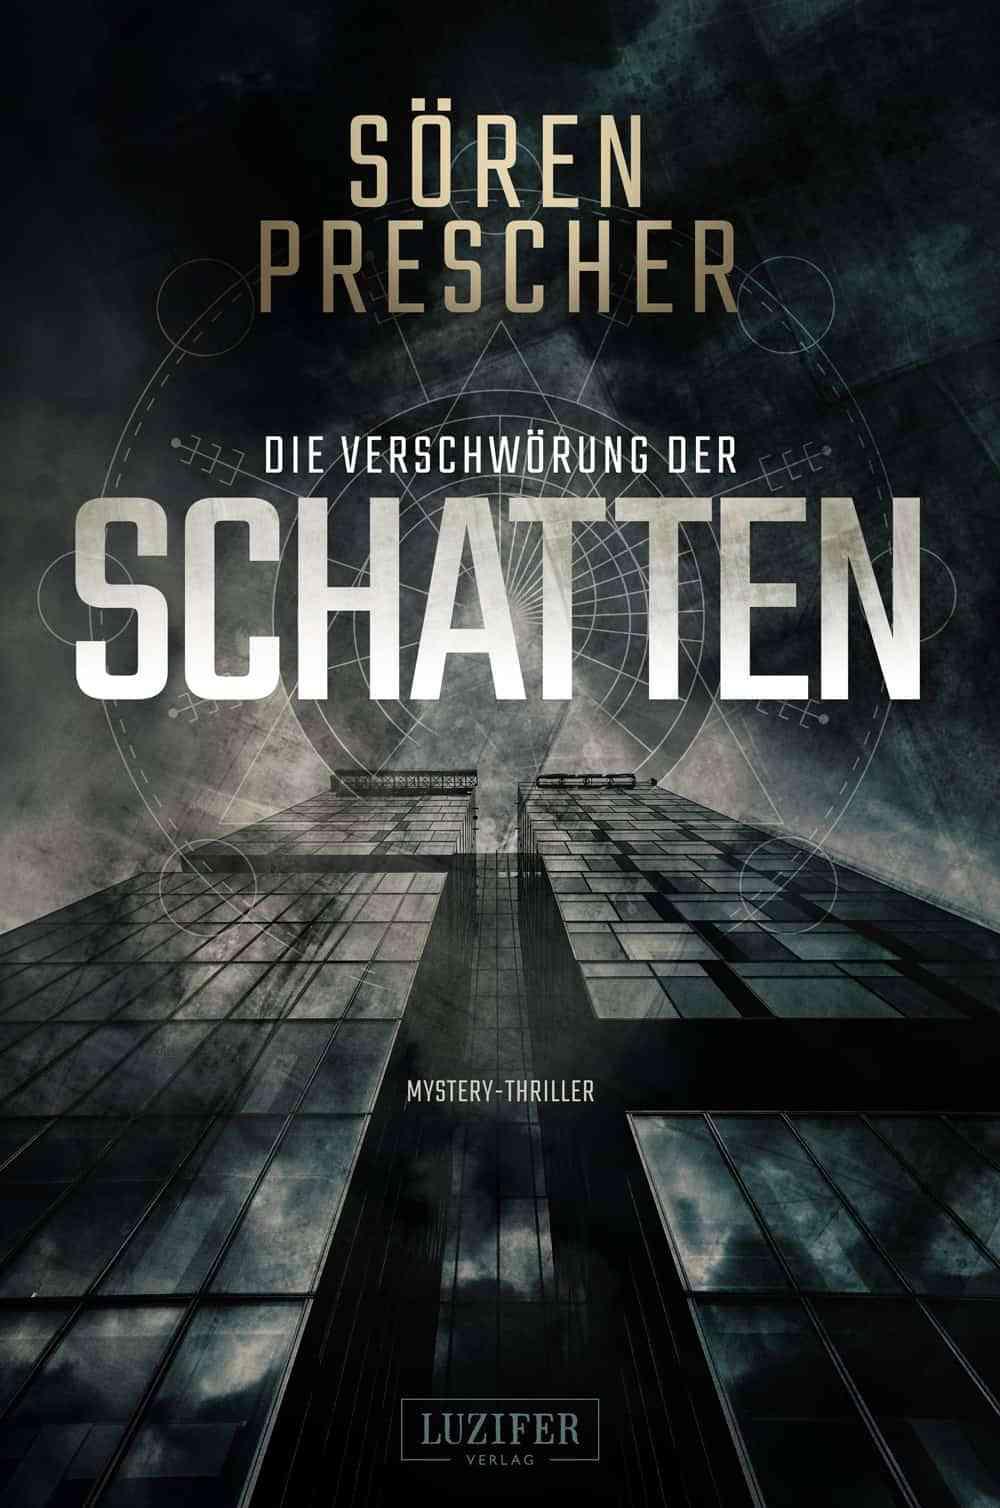 Die-Verschwoerung-der-Schatten_Soeren-Prescher.jpg